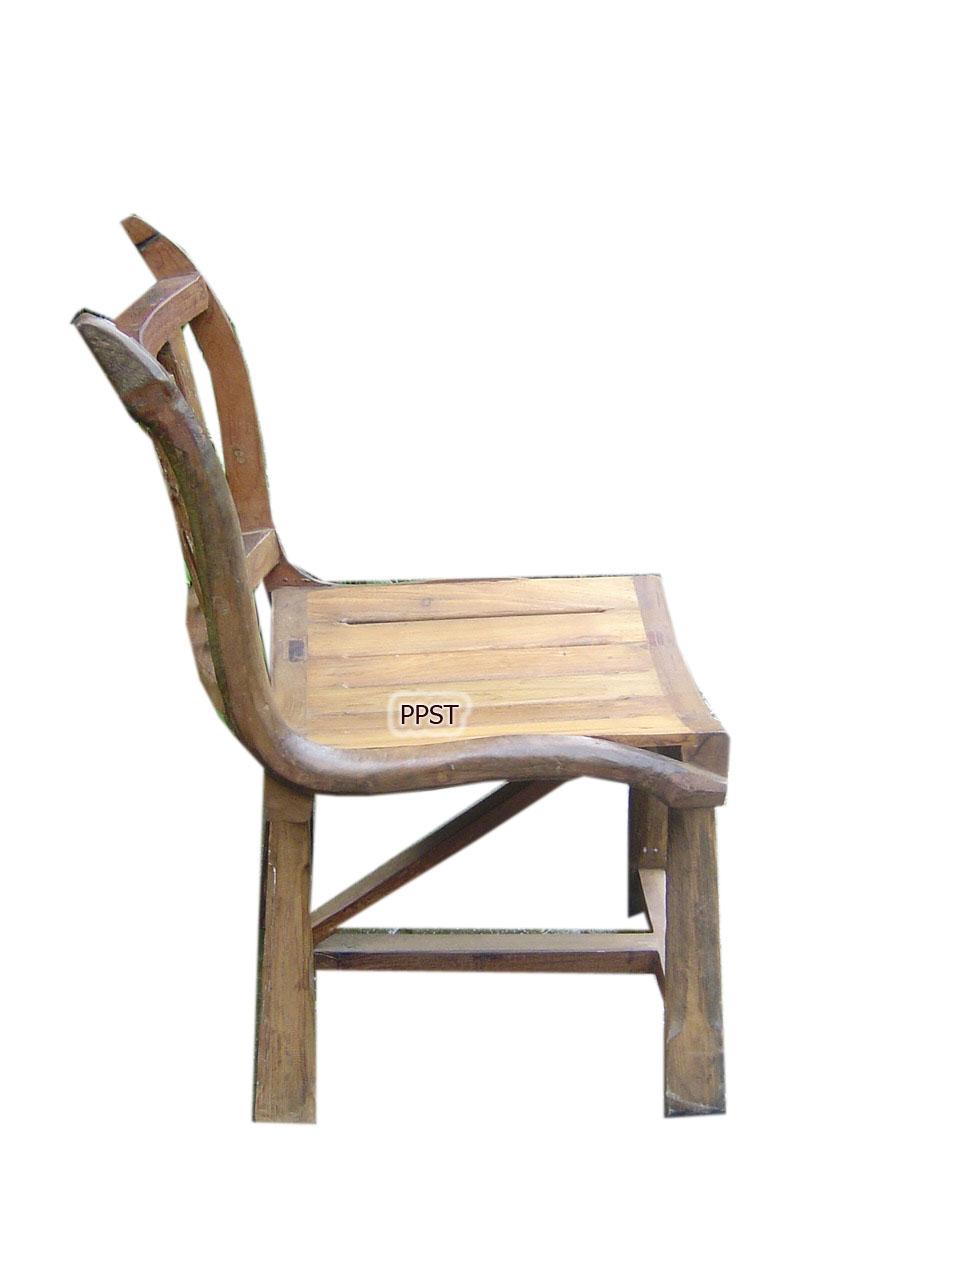 Antique Chair-sn009-2